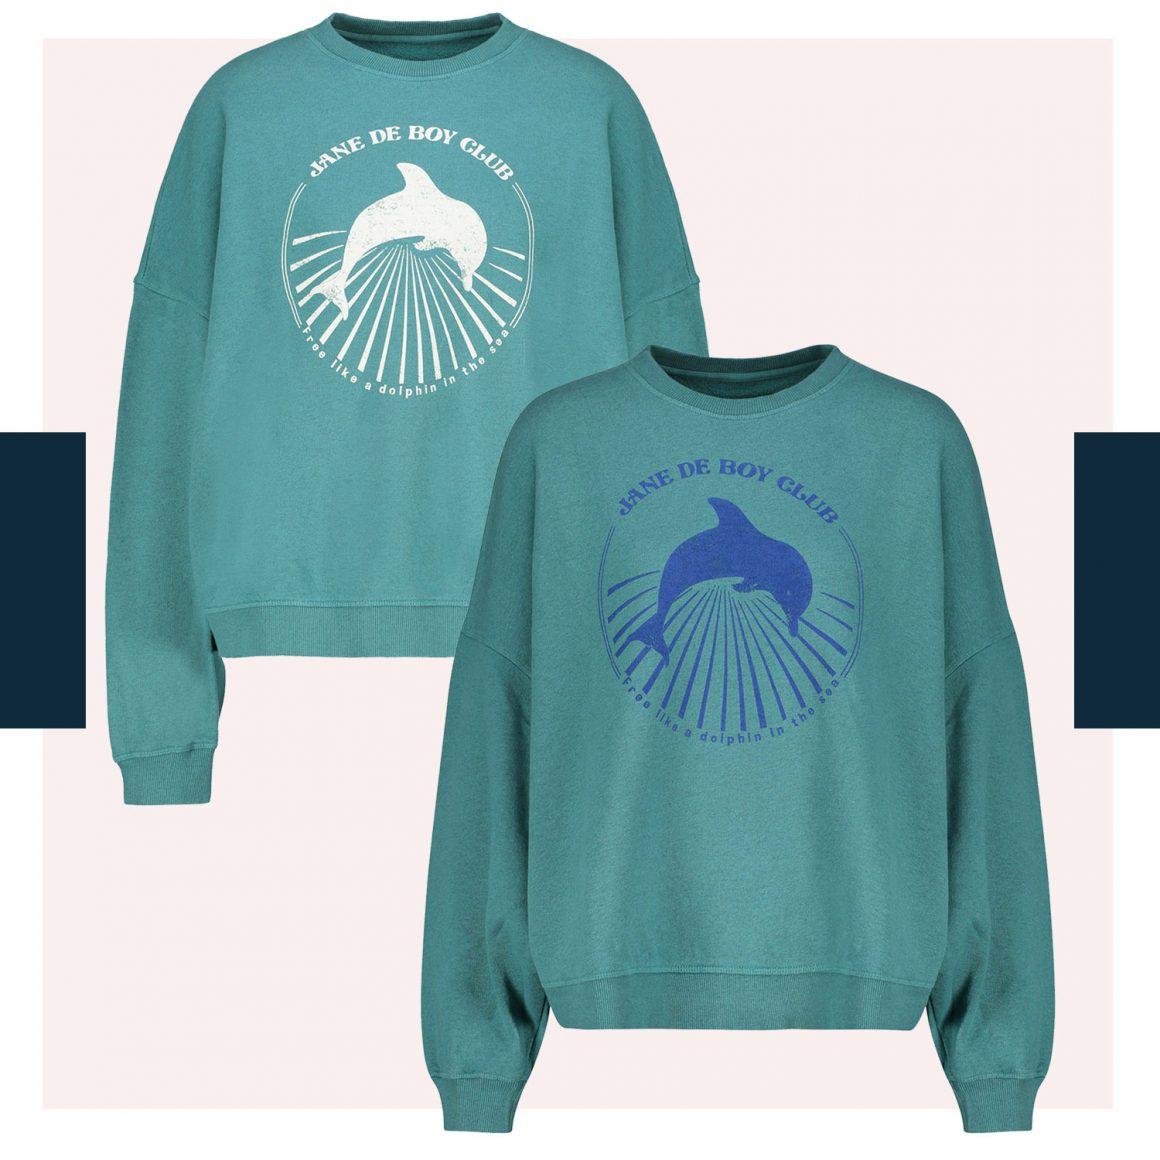 Le sweat-shirt Dolphin Jane de Boy Club de Swildens